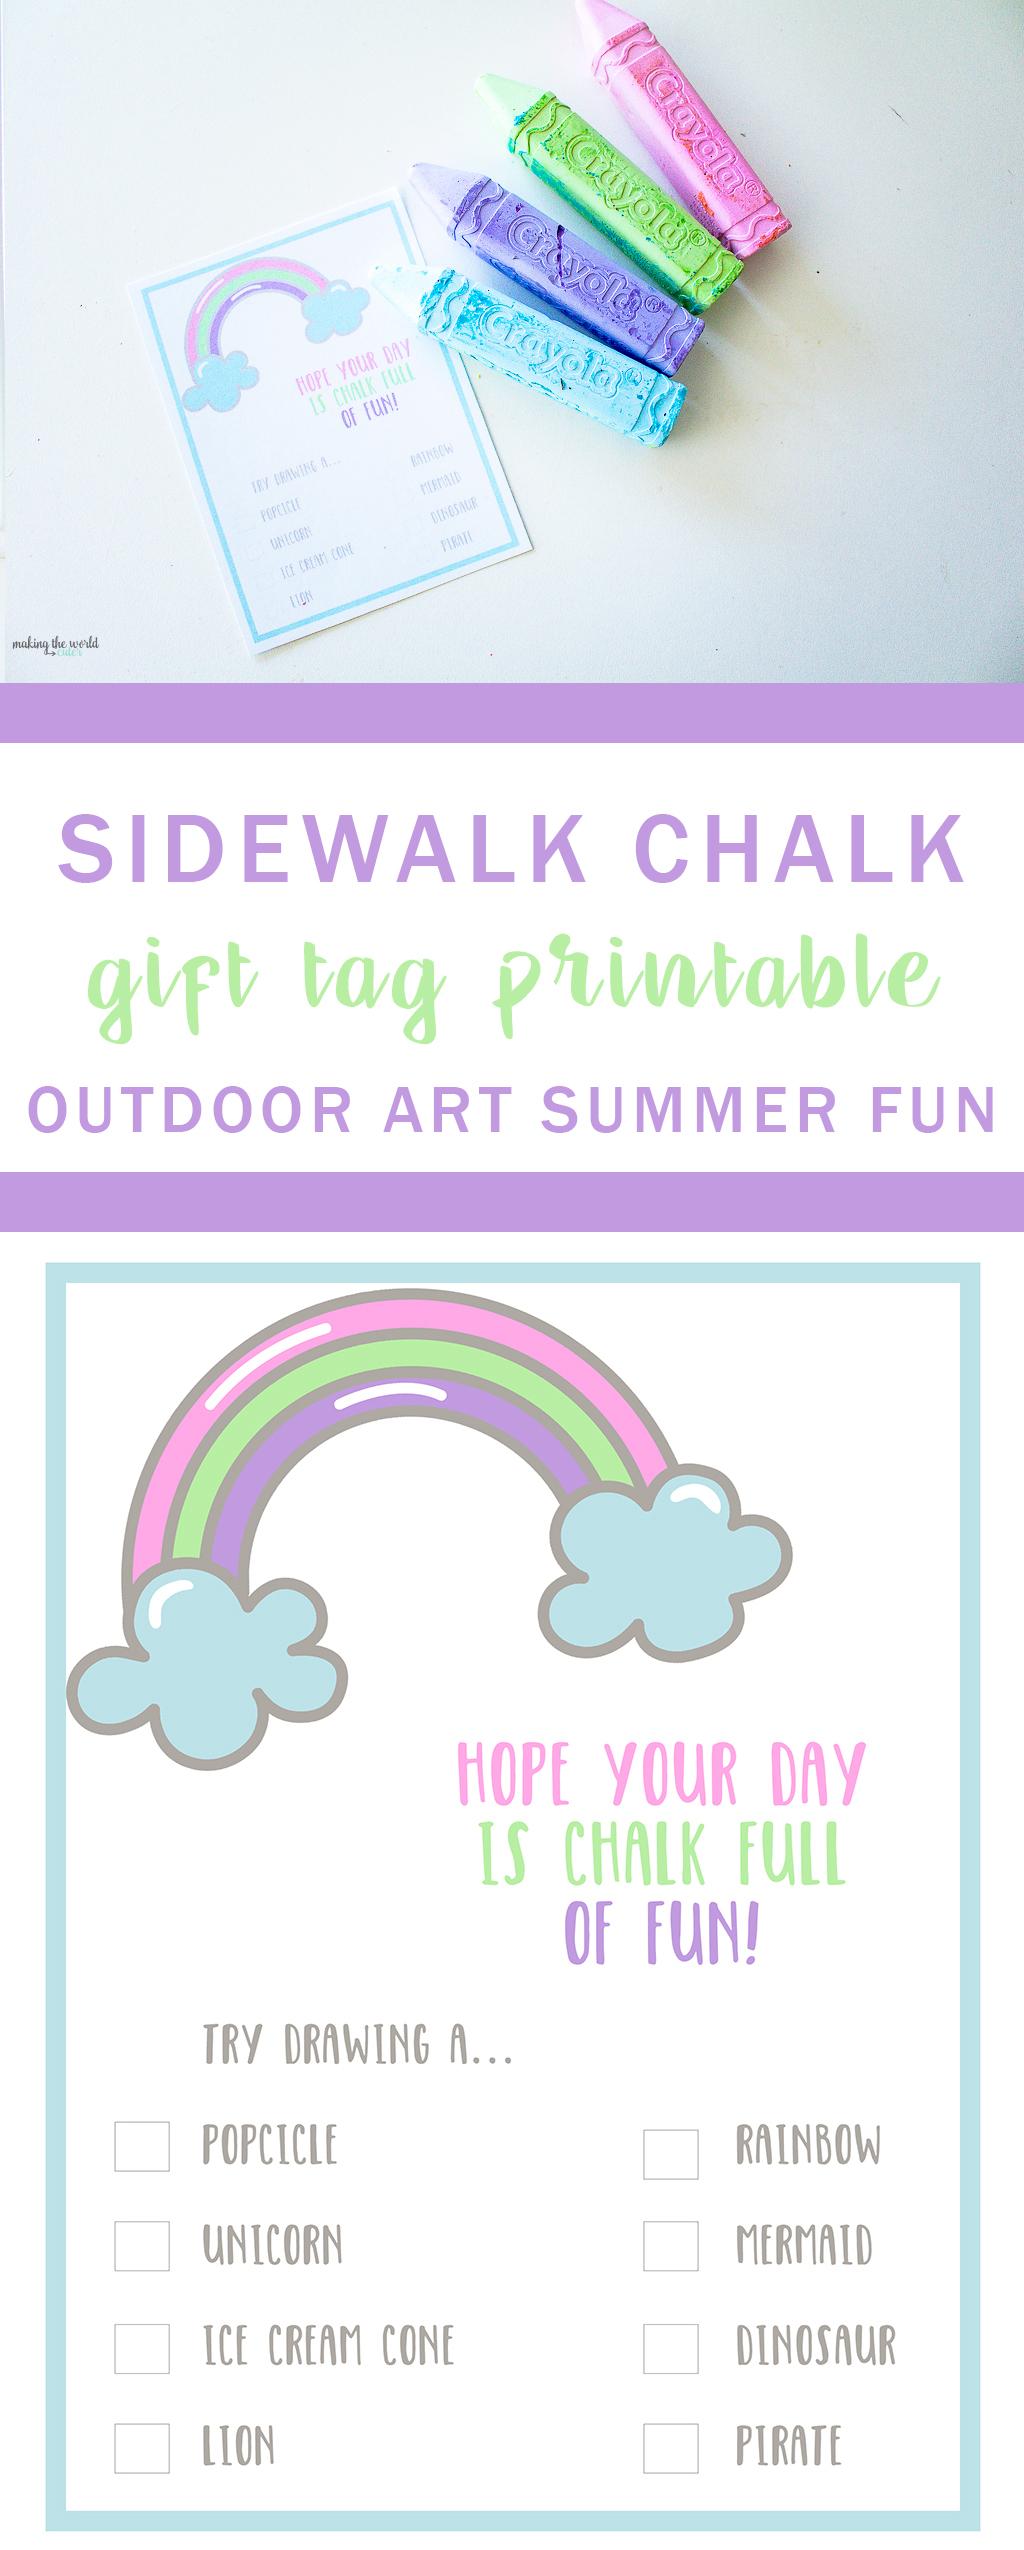 http://makingtheworldcuter.com/wp-content/uploads/2017/04/Sidewalk-Chalk-Gift-tag-printable.jpg